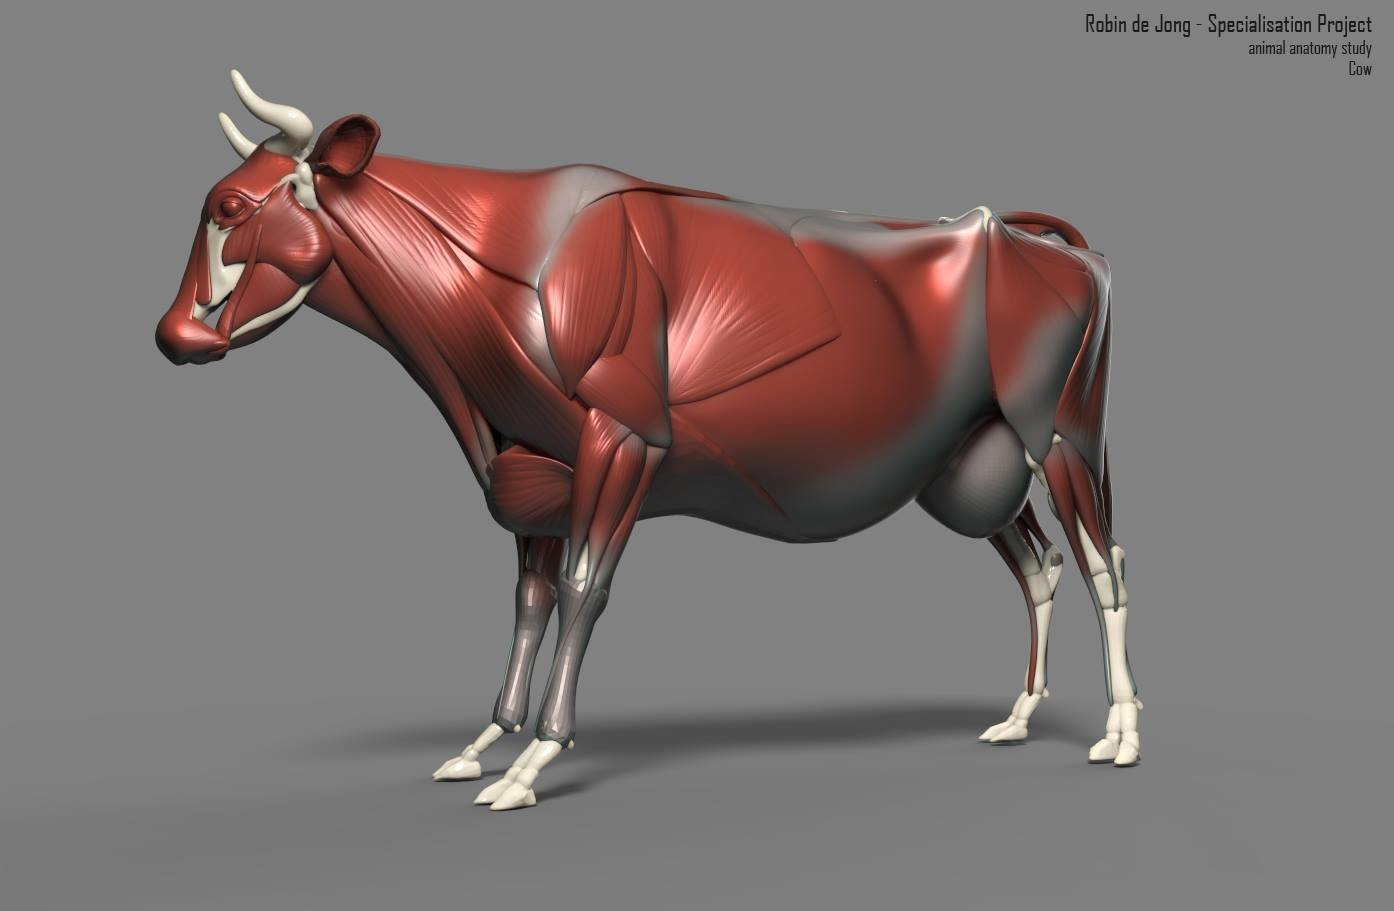 ArtStation - cow anatomy study, Robin de Jong